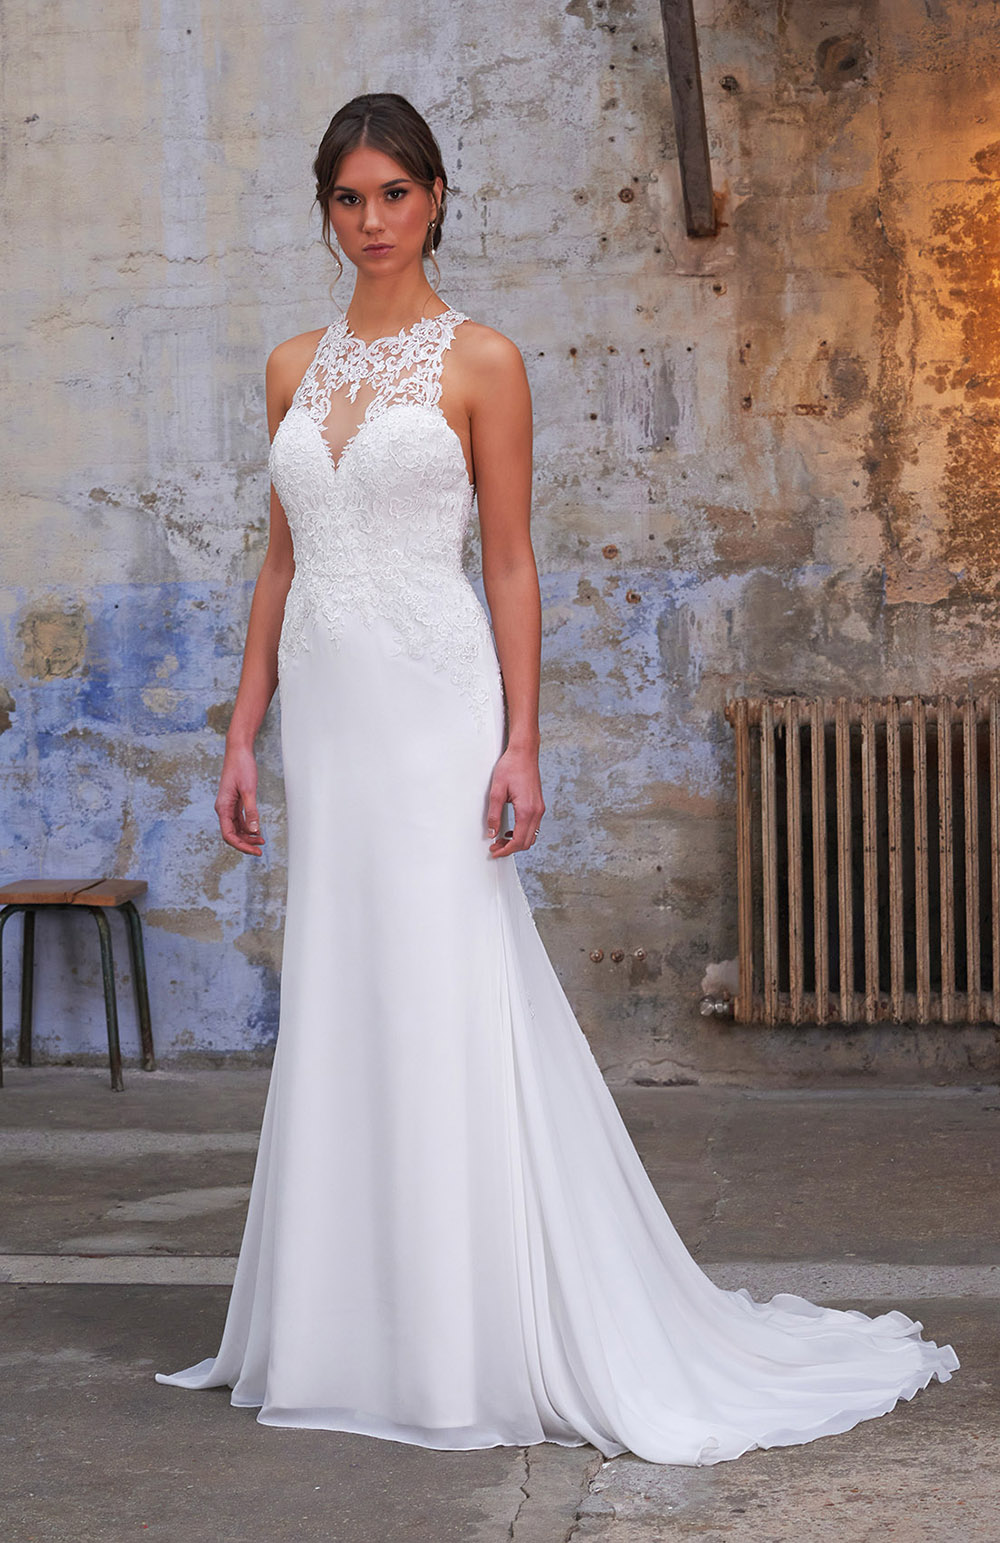 Robe de mariée Modèle Joye